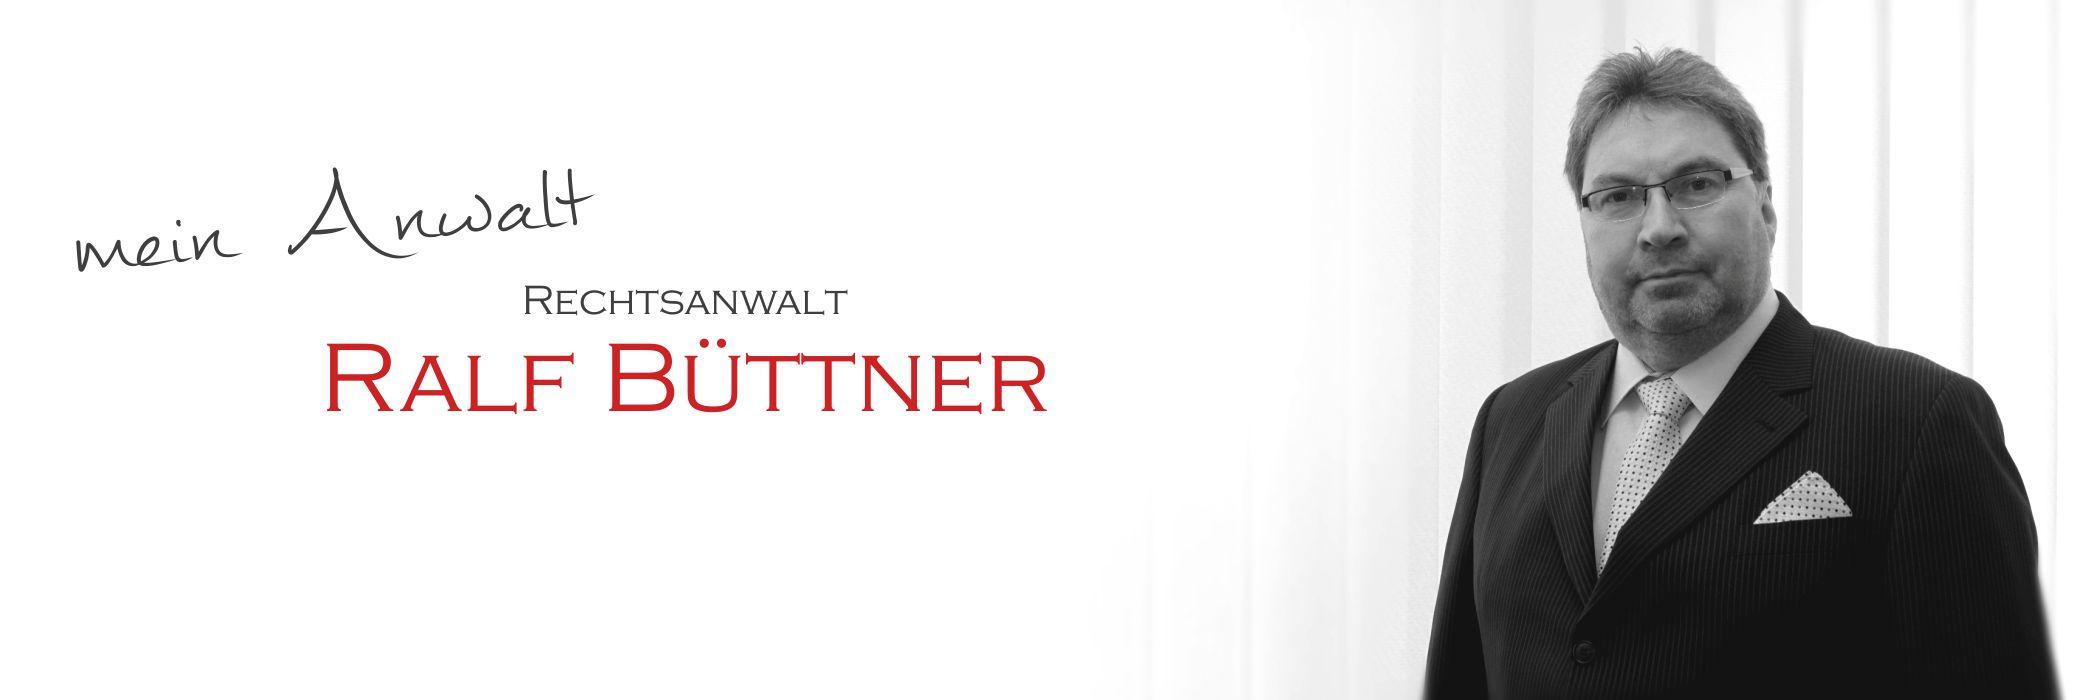 https://xn--mein-anwalt-bttner-y6b.de/wp-content/uploads/2017/03/Banner_Büttner-106.jpg